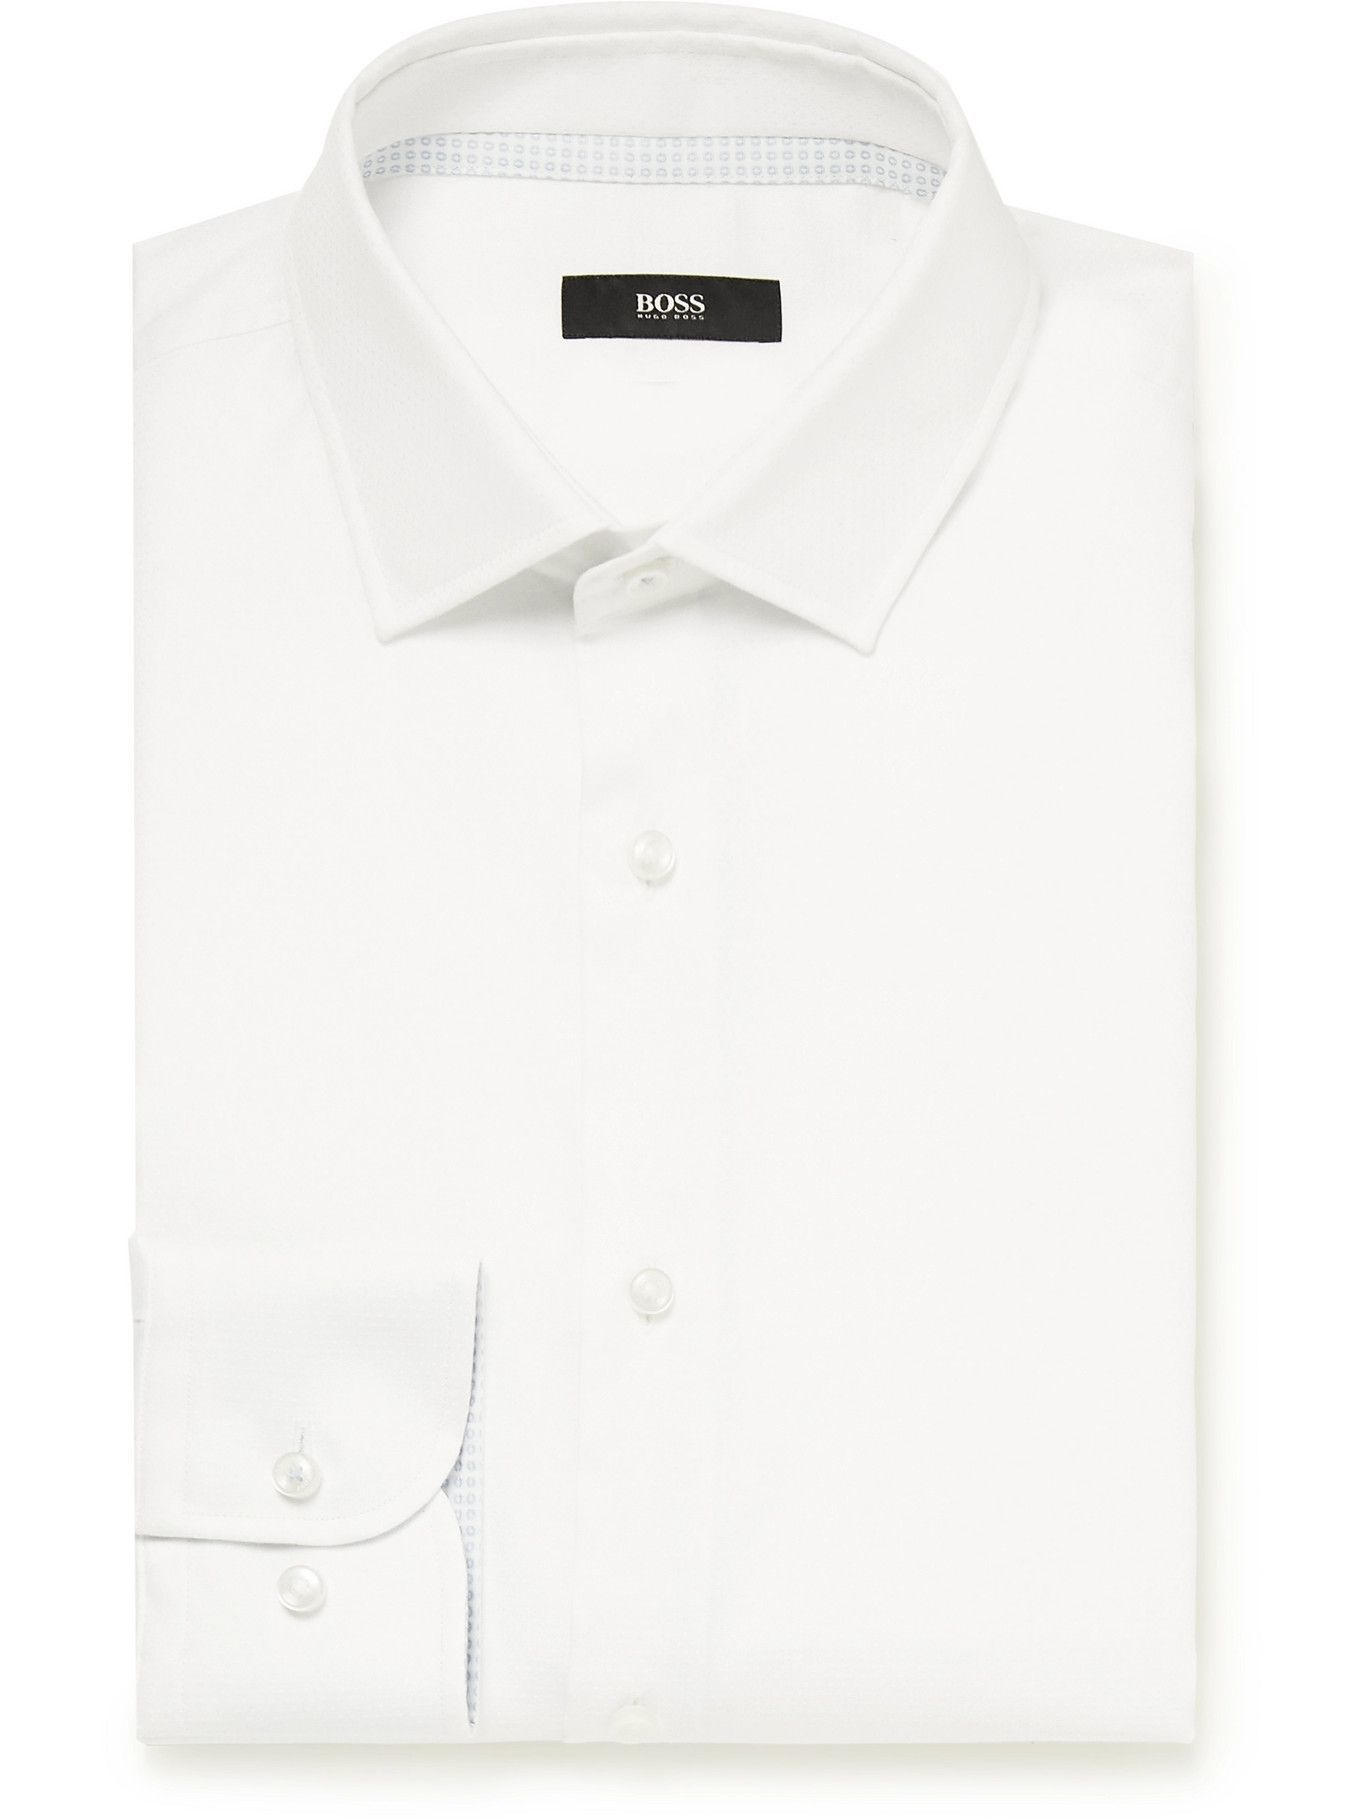 HUGO BOSS - Jesse Slim-Fit Cotton Shirt - White